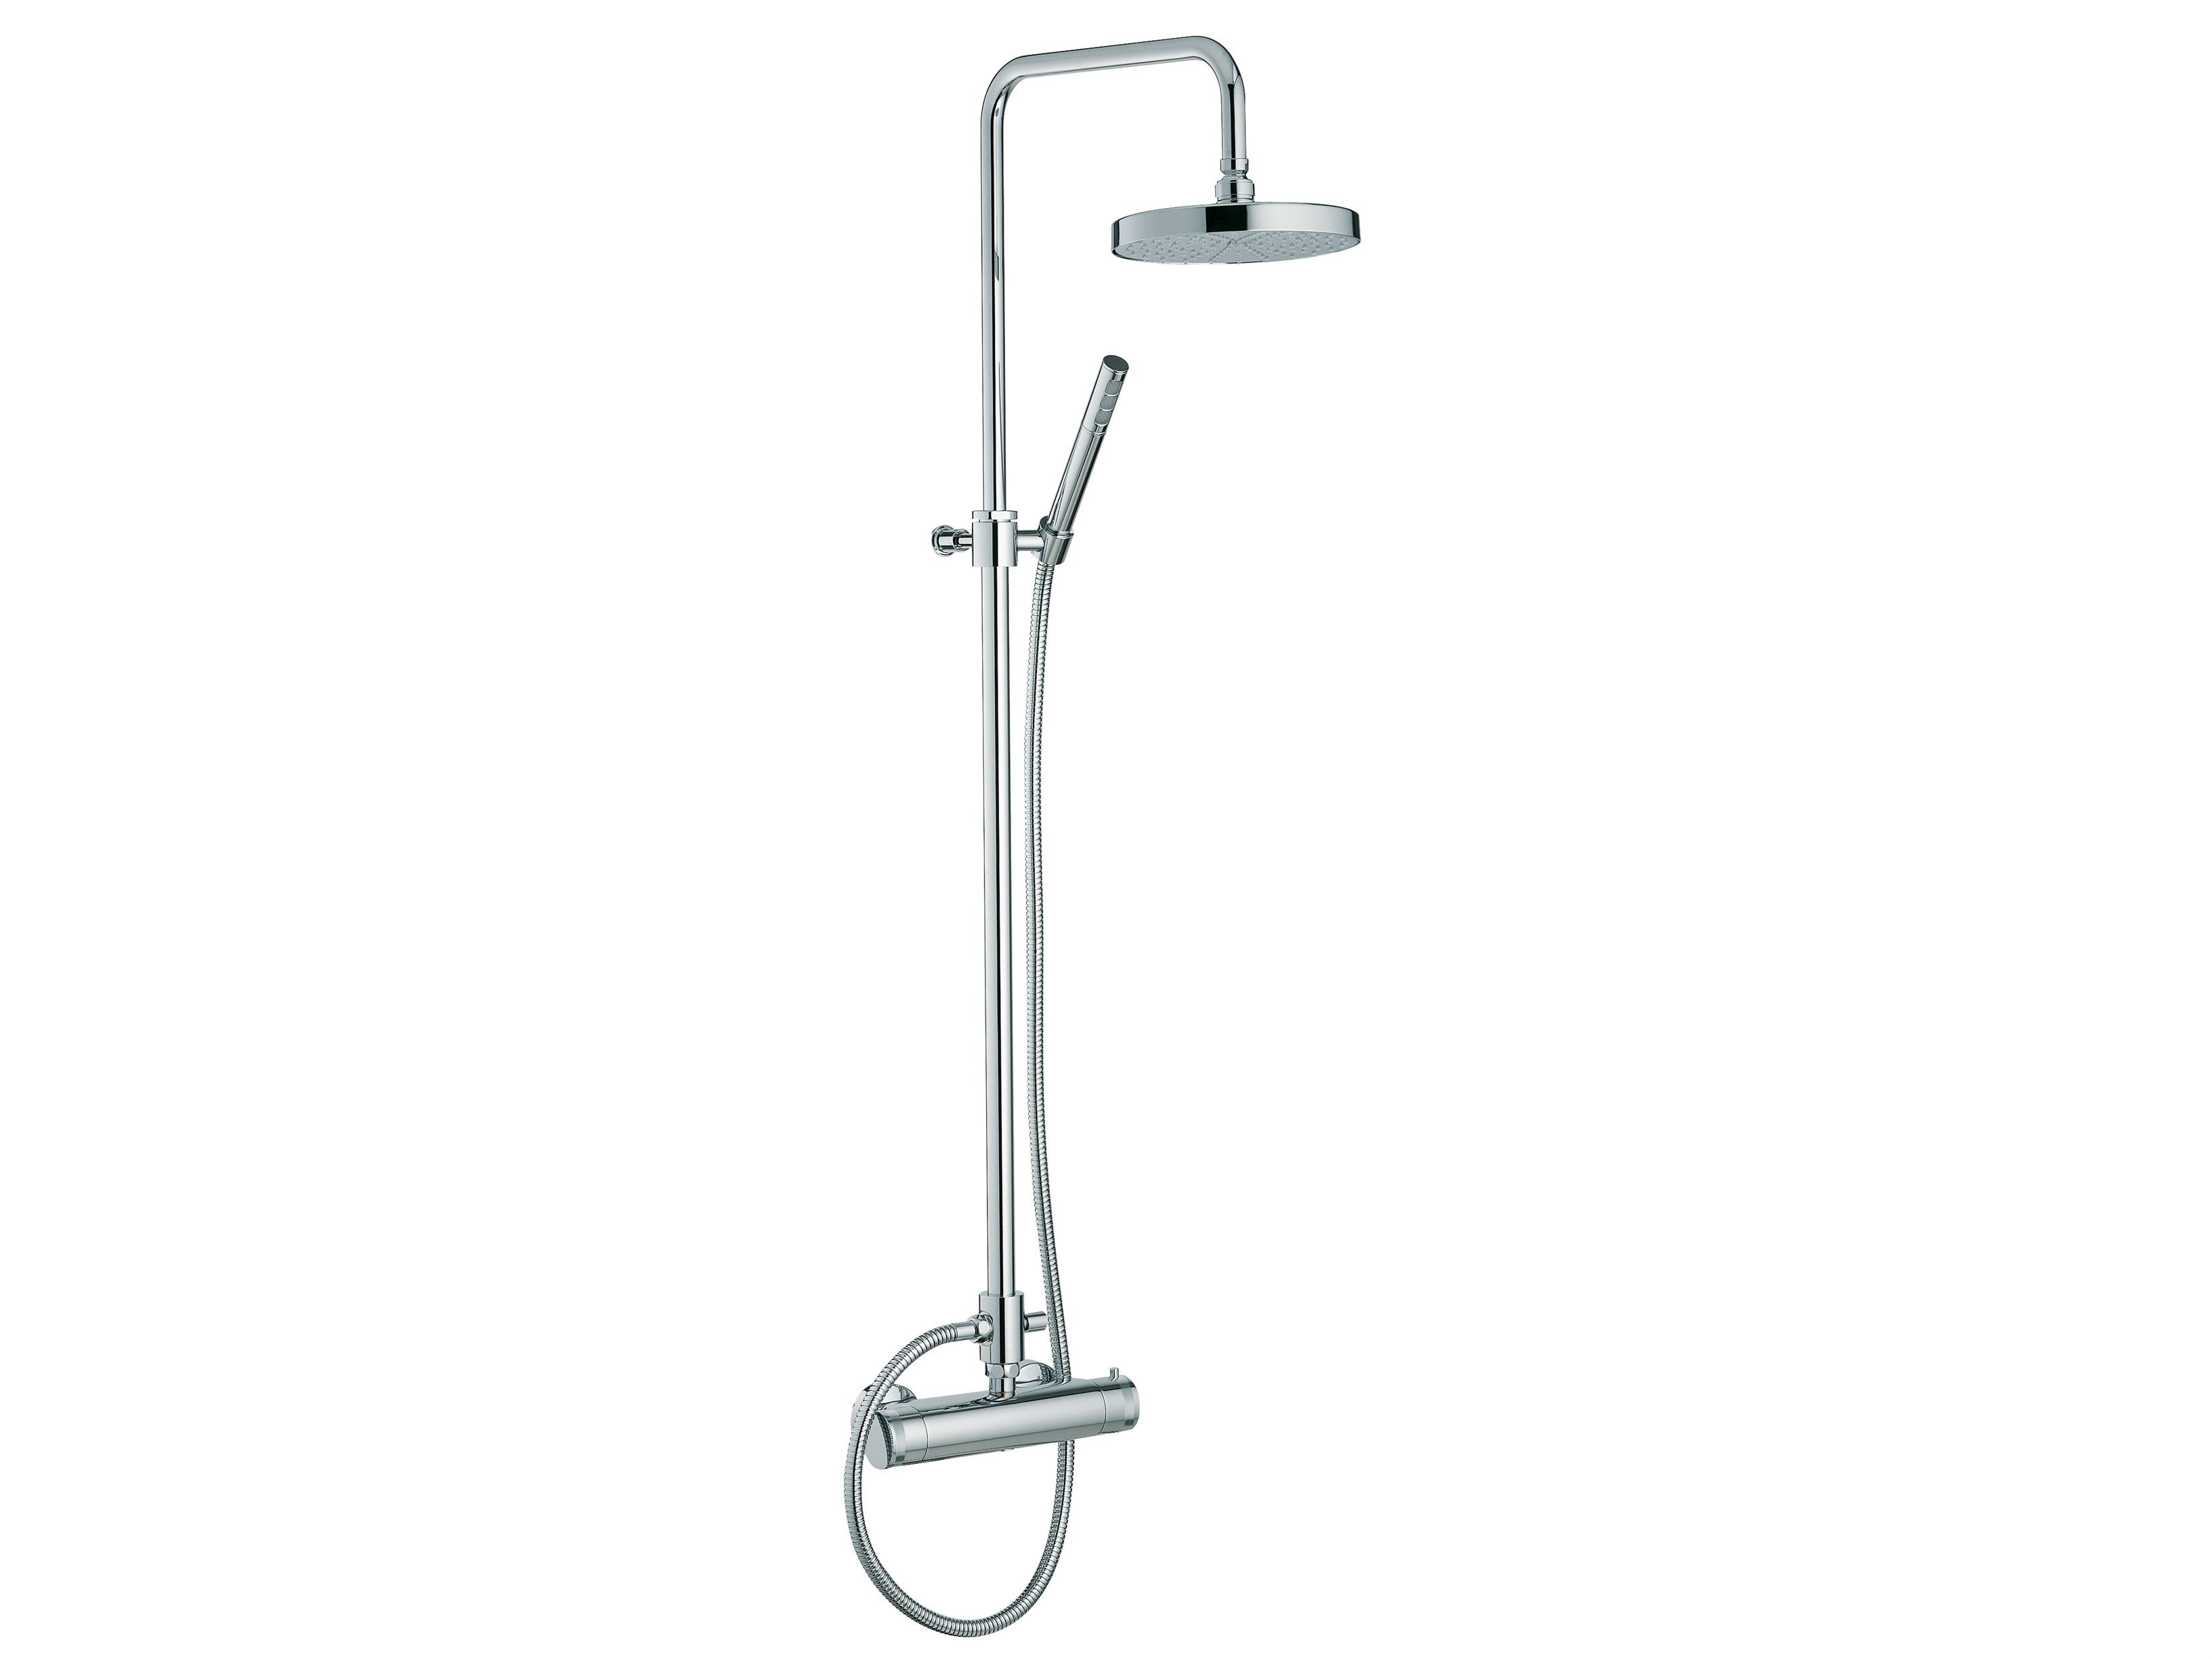 Pumps tubos termo boiler grifo con ducha for Duchas grohe precios